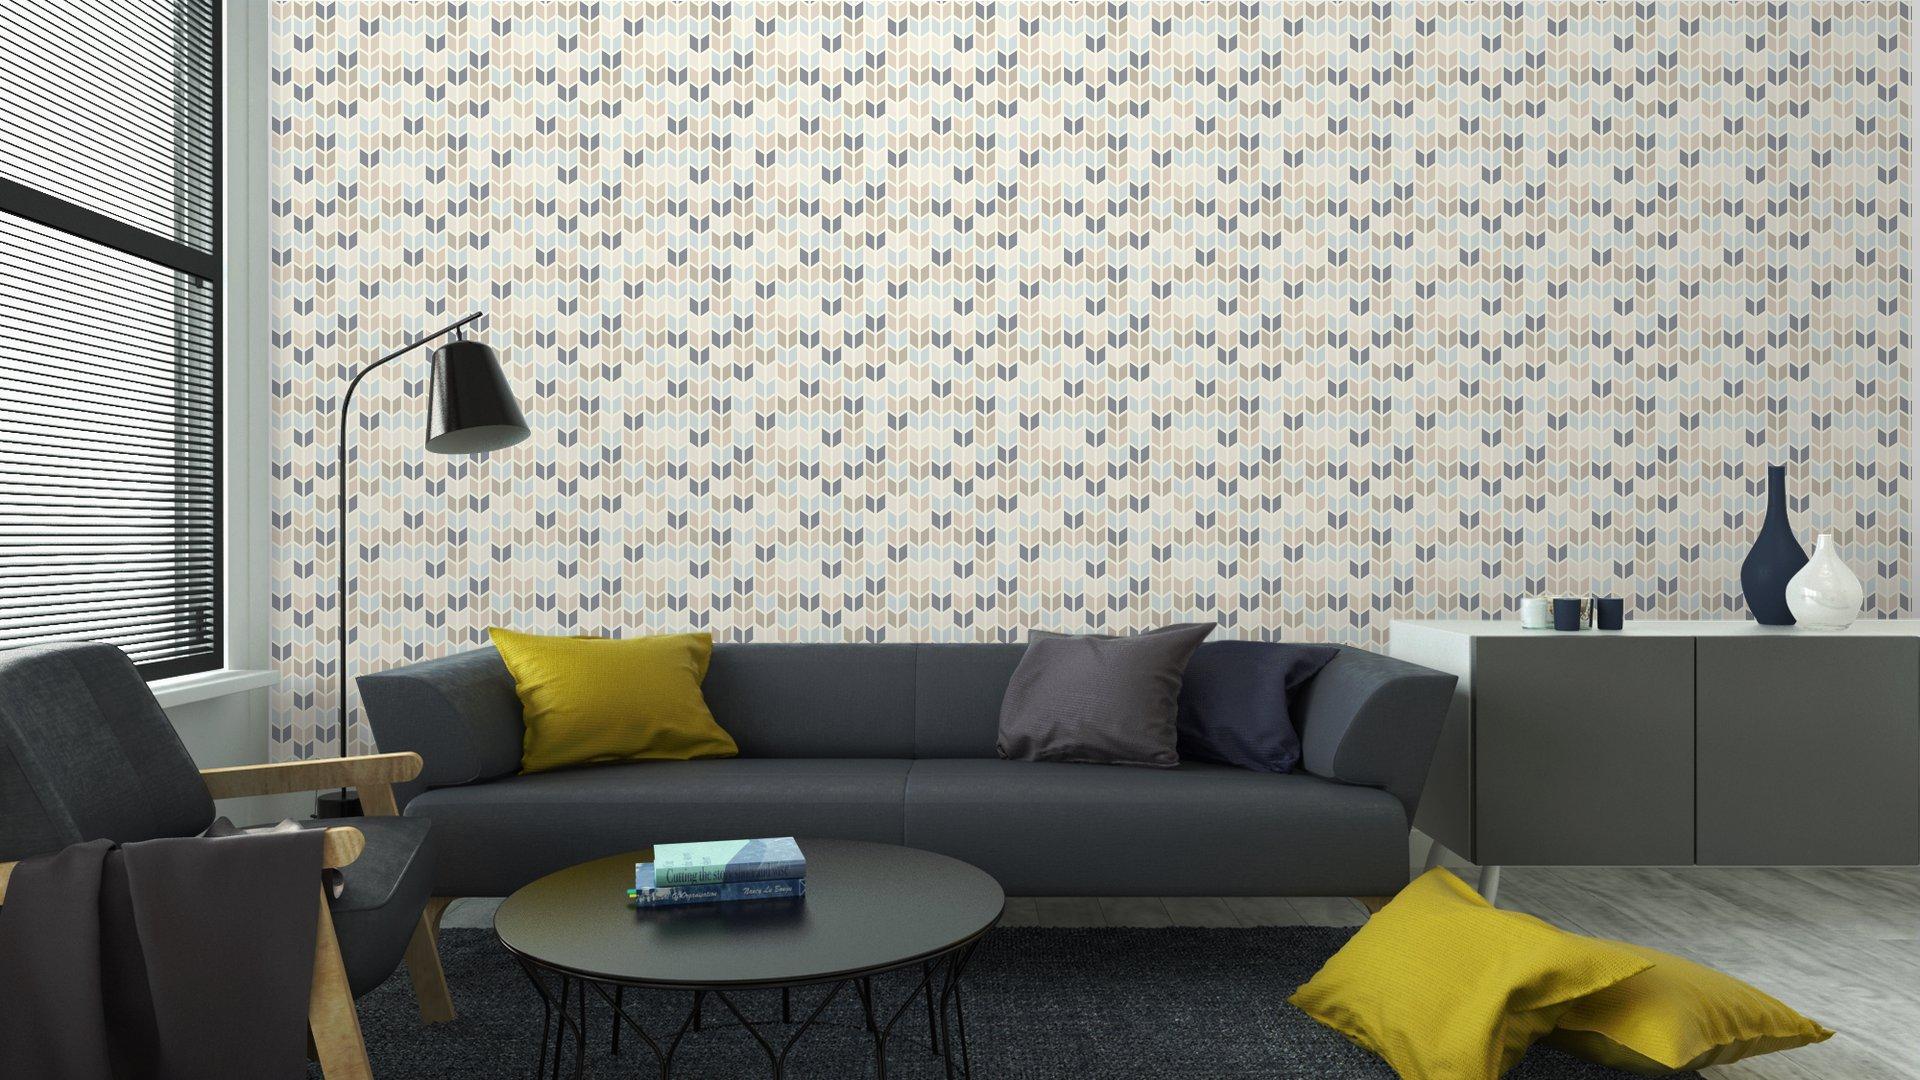 Fotomurales mexico papeles pintados lavables seamless patron geometrico en tonos pastel 6 - Papel Tapiz Patrón Geométrico Tonos Pastel 01